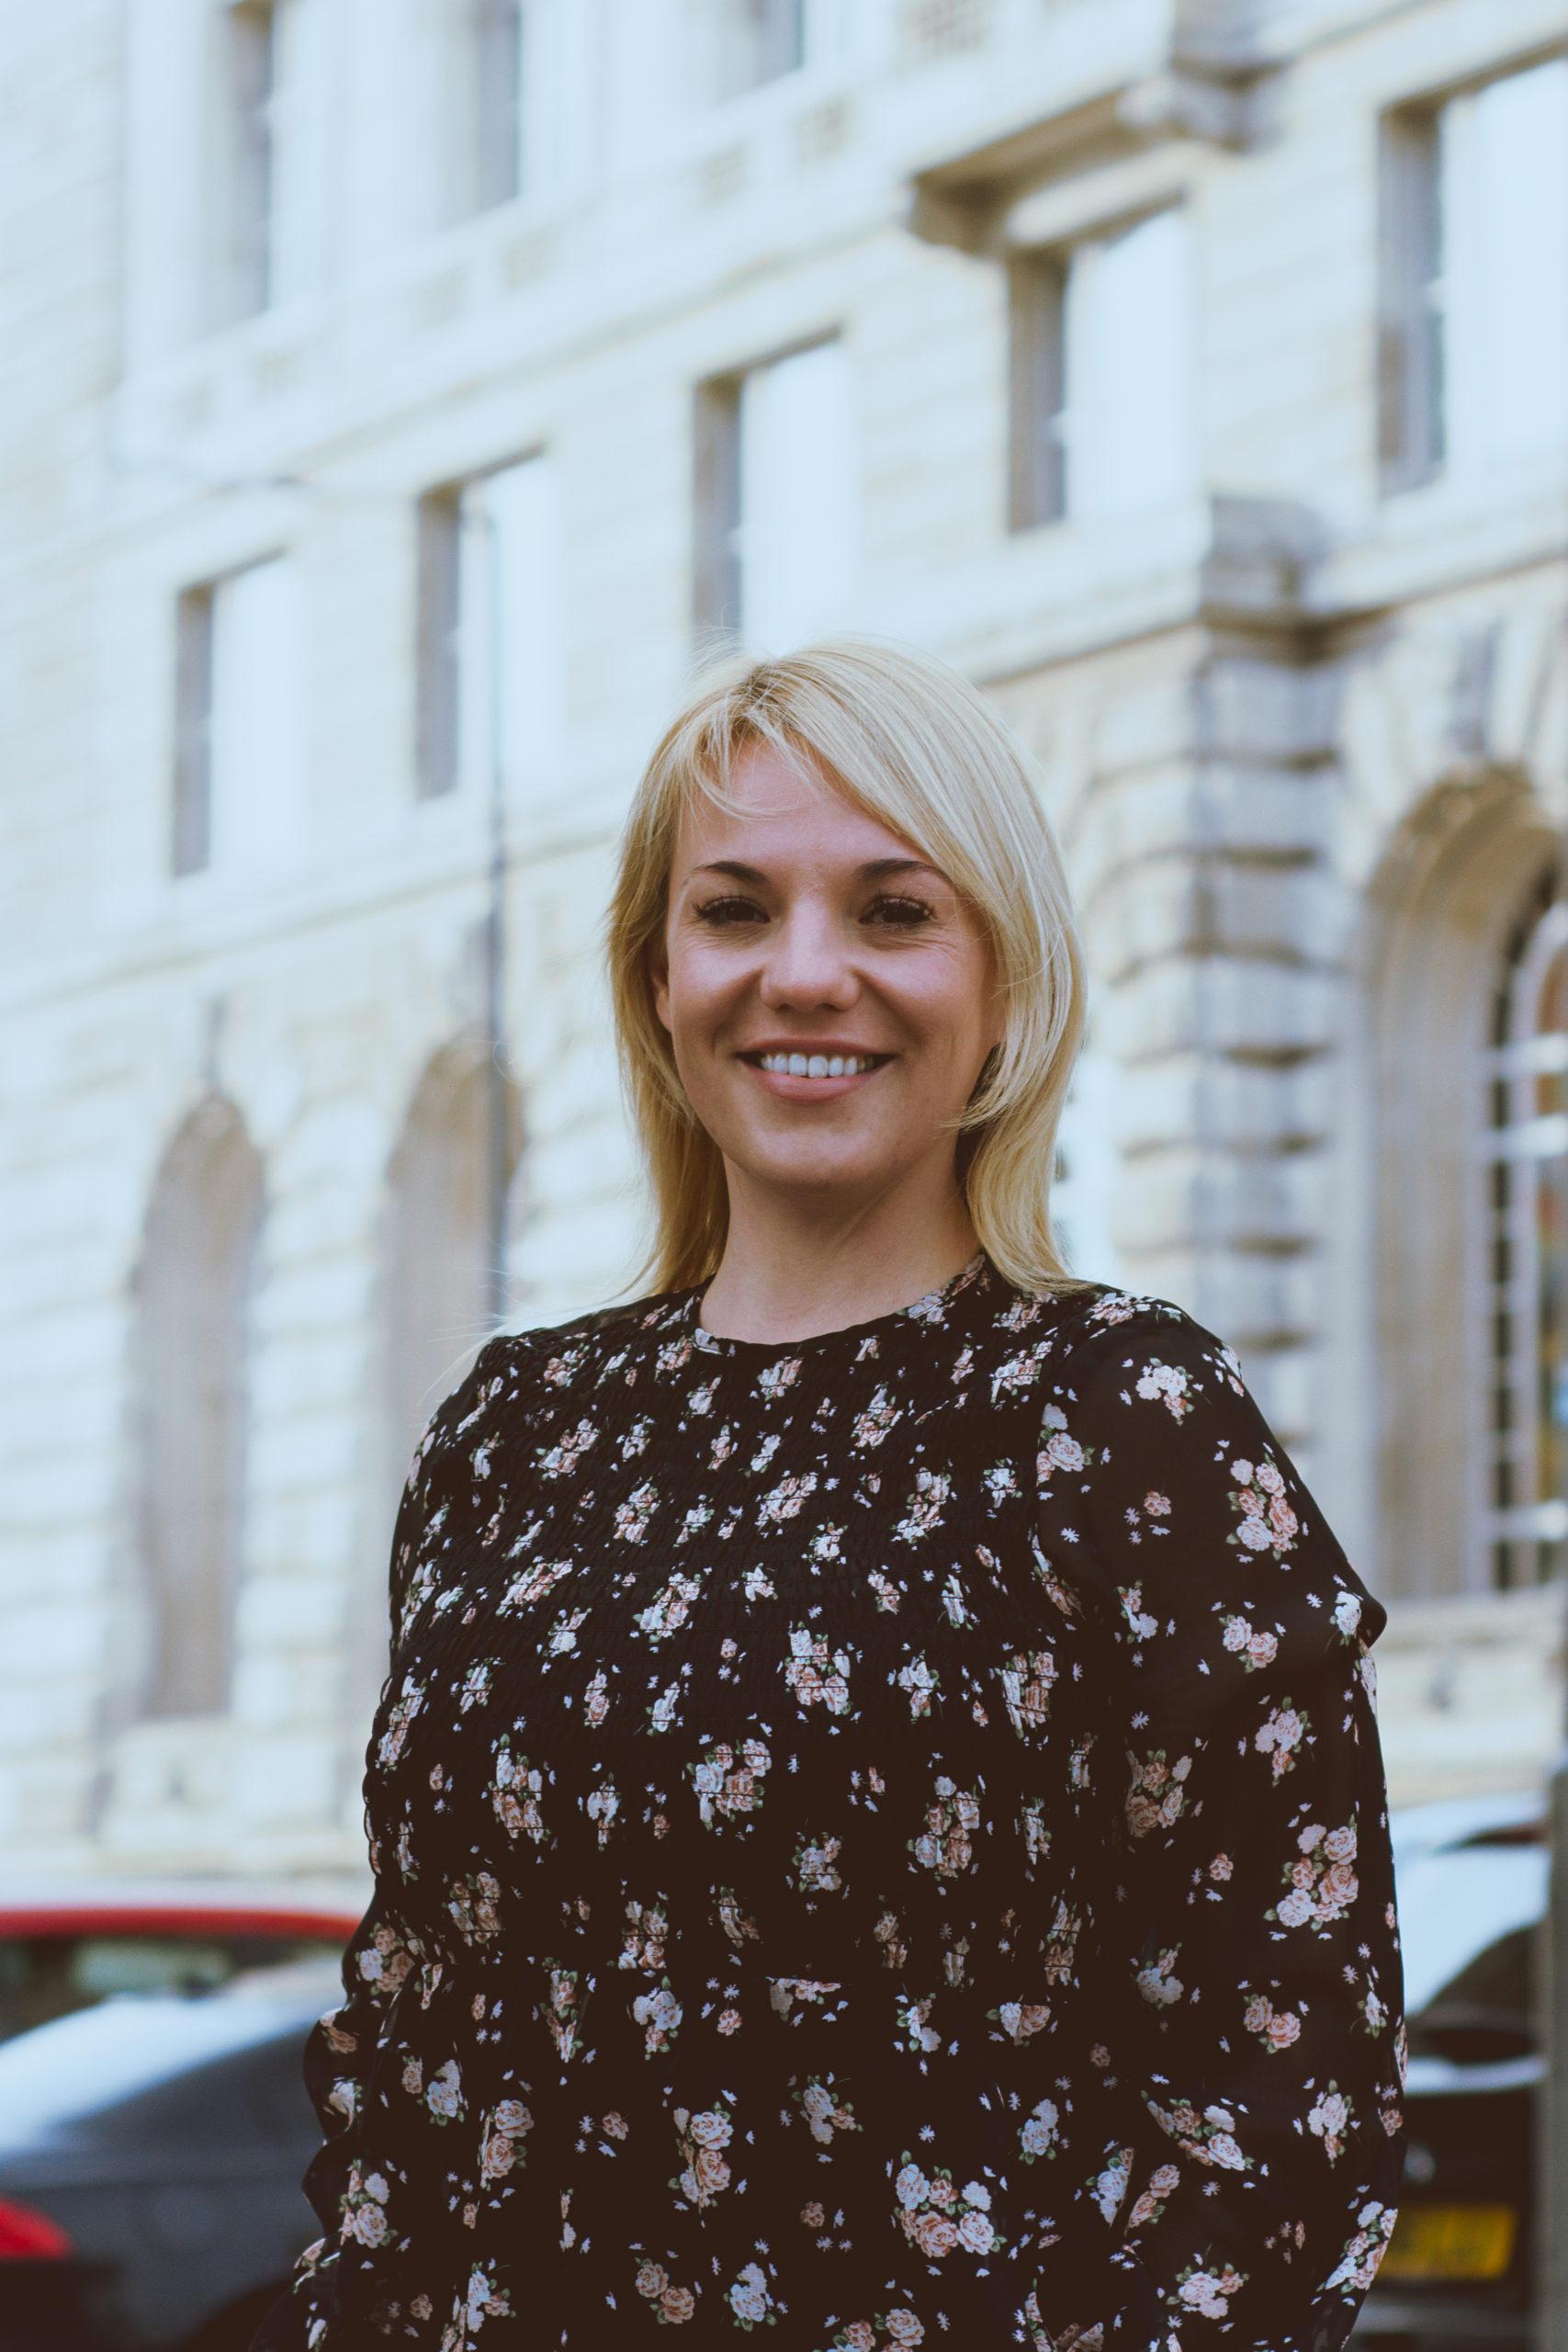 Amanda Medwell